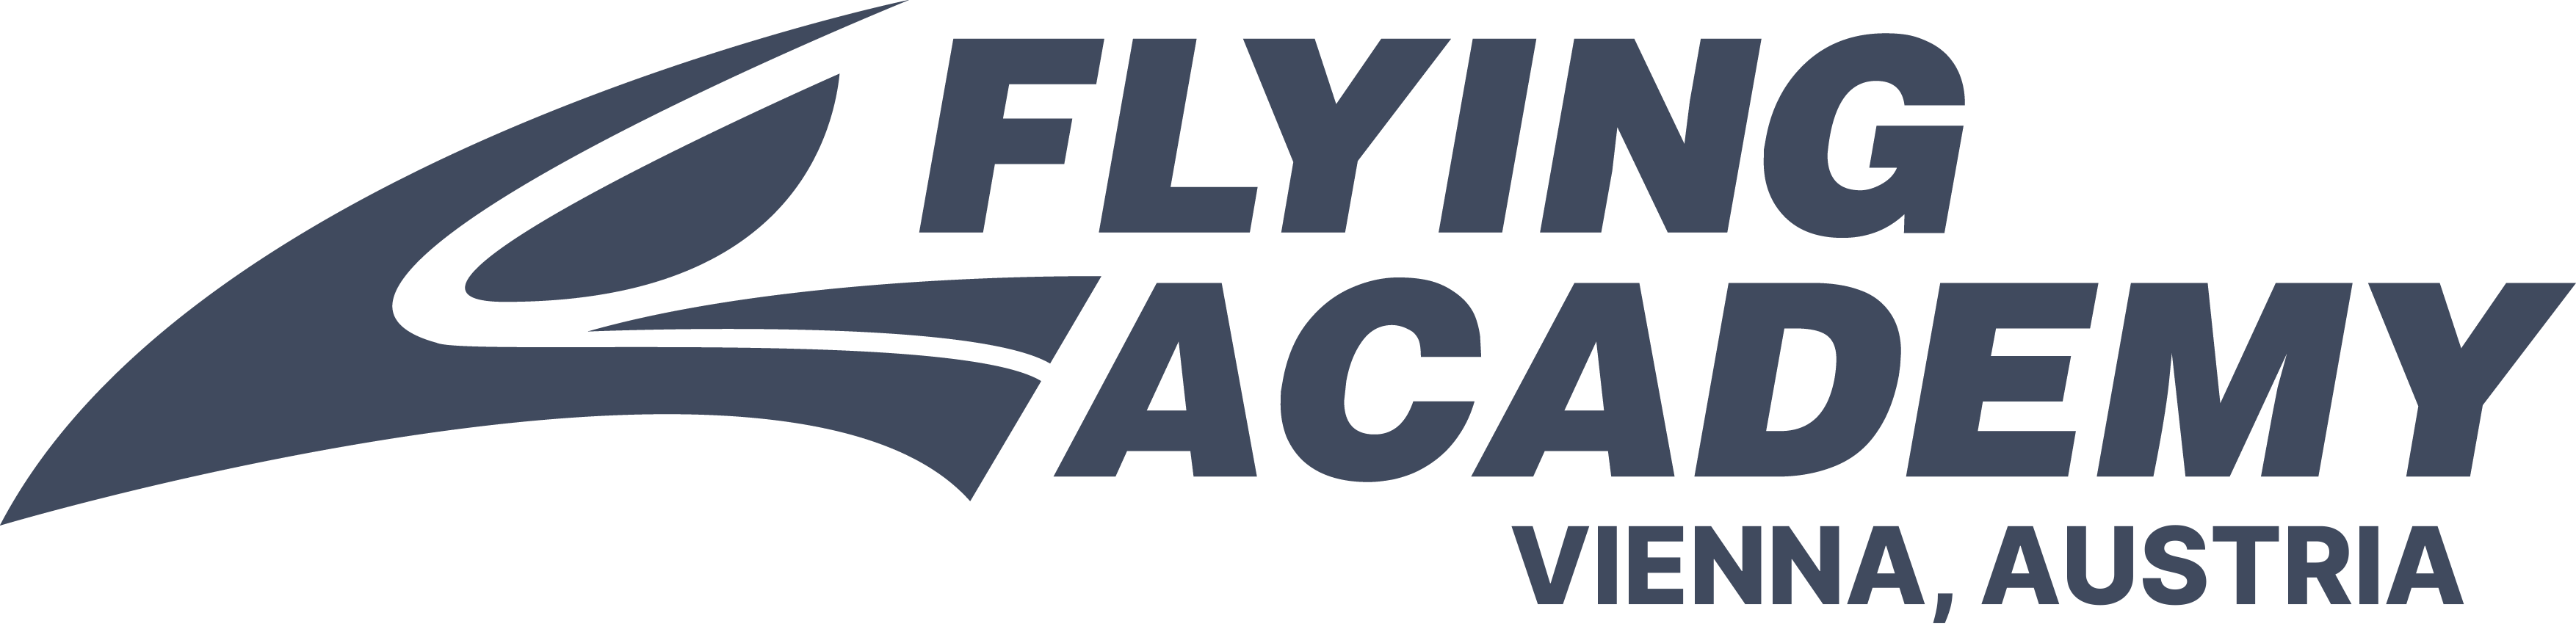 Flying Academy Vienna | Professional Pilot Training